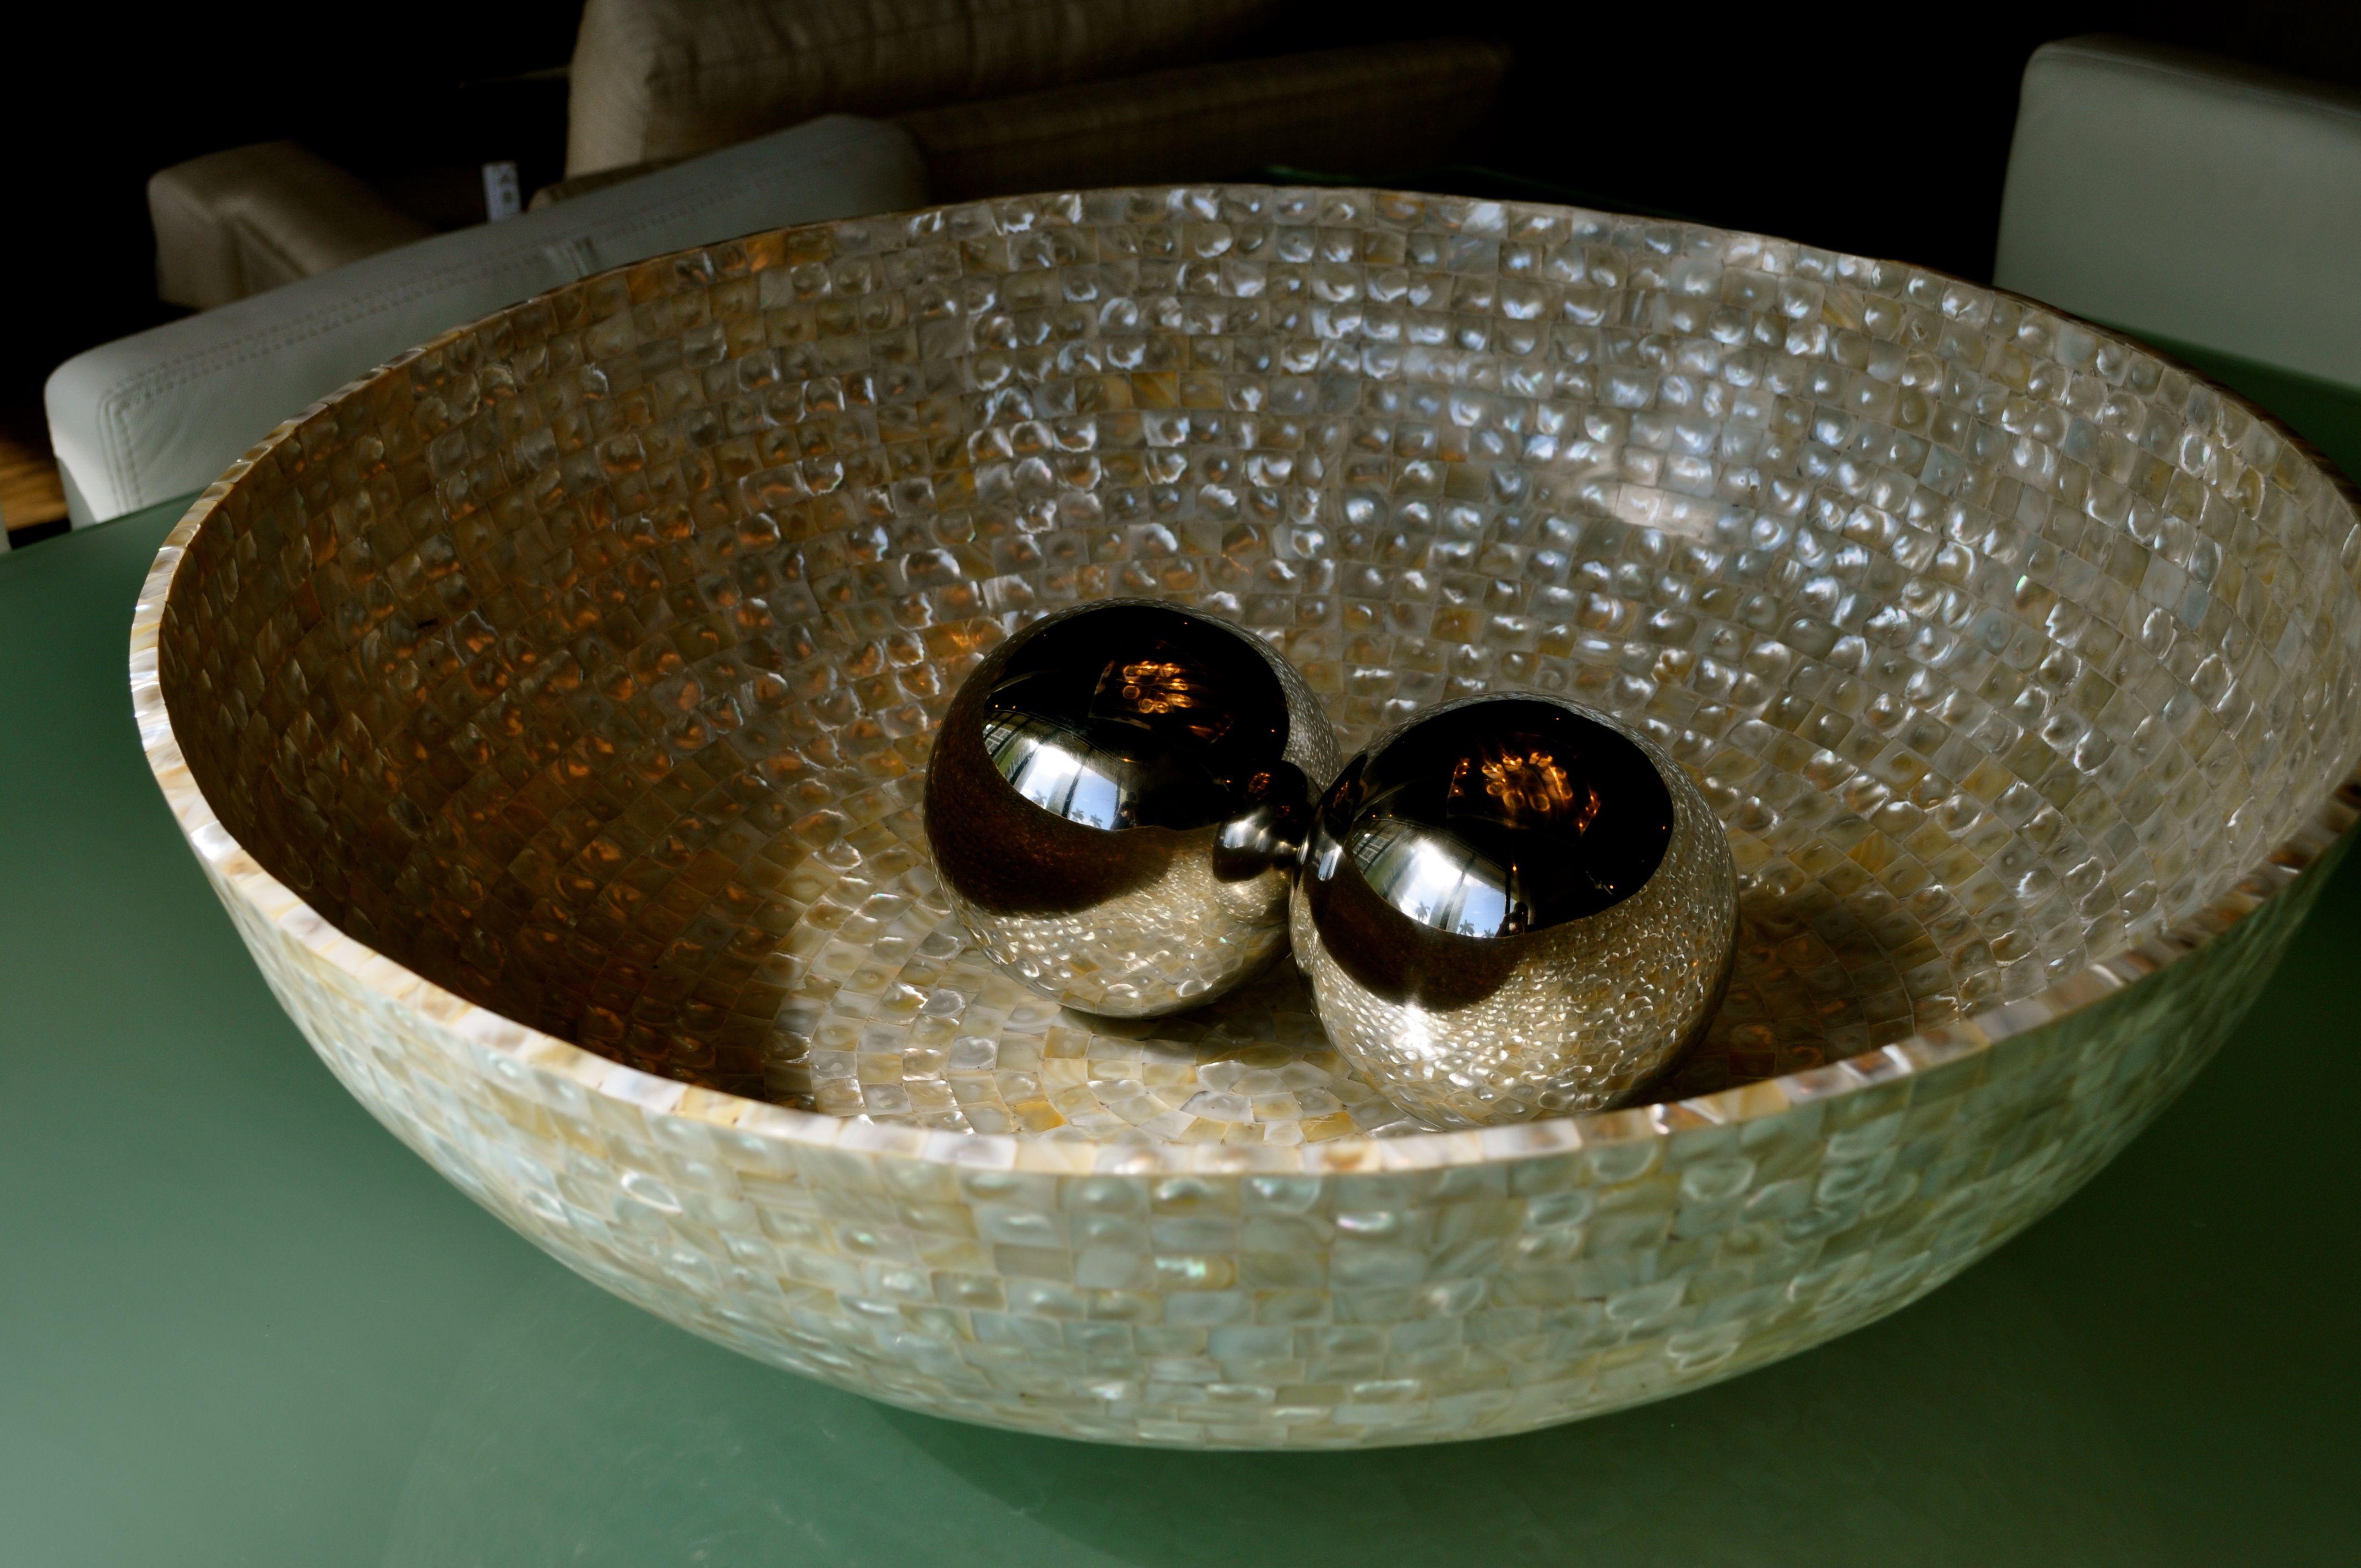 #Bowl #Tableware #Interior Design #Mother-of-Pearl